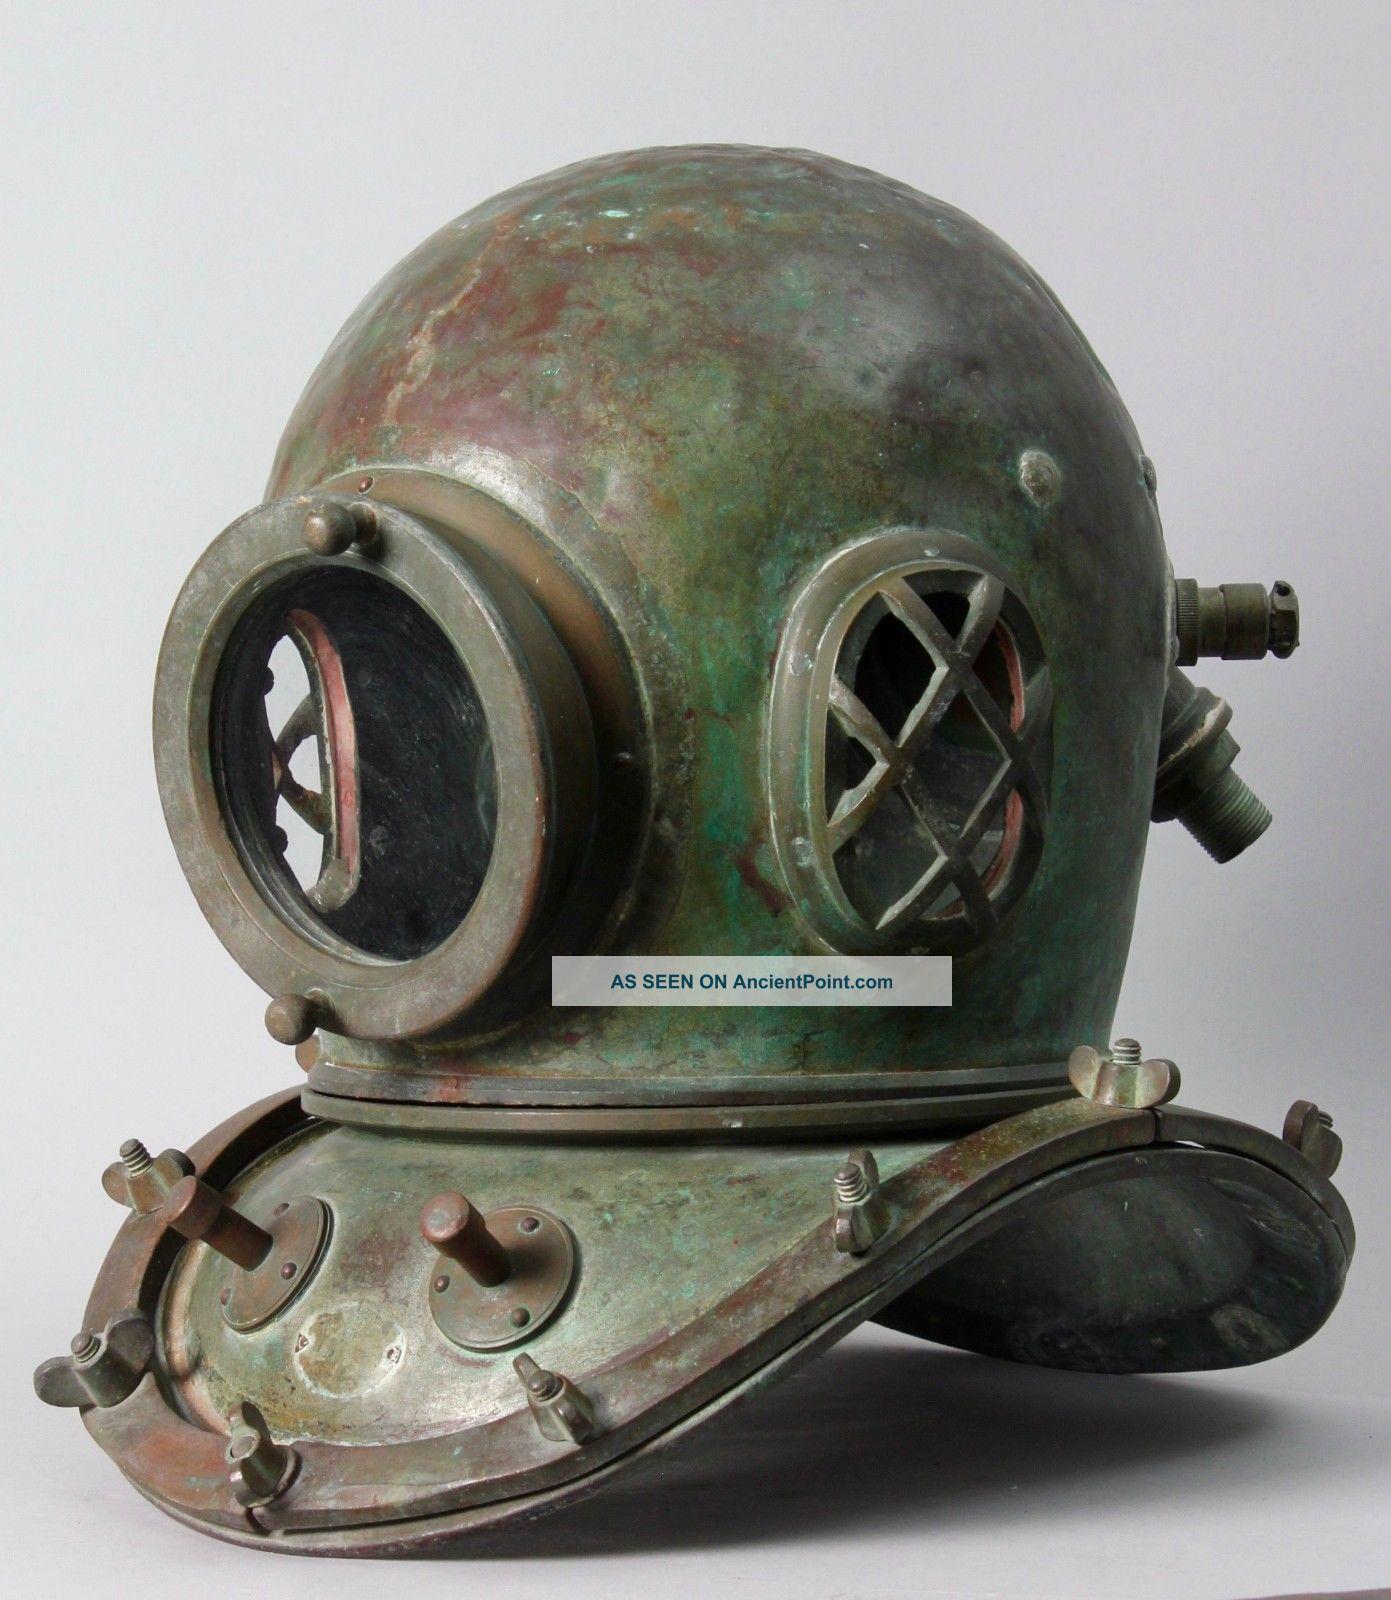 Japanese Authentic Diving Helmet.  12 Bolt.  Circa 1920 - 40 S G23 Diving Helmets photo